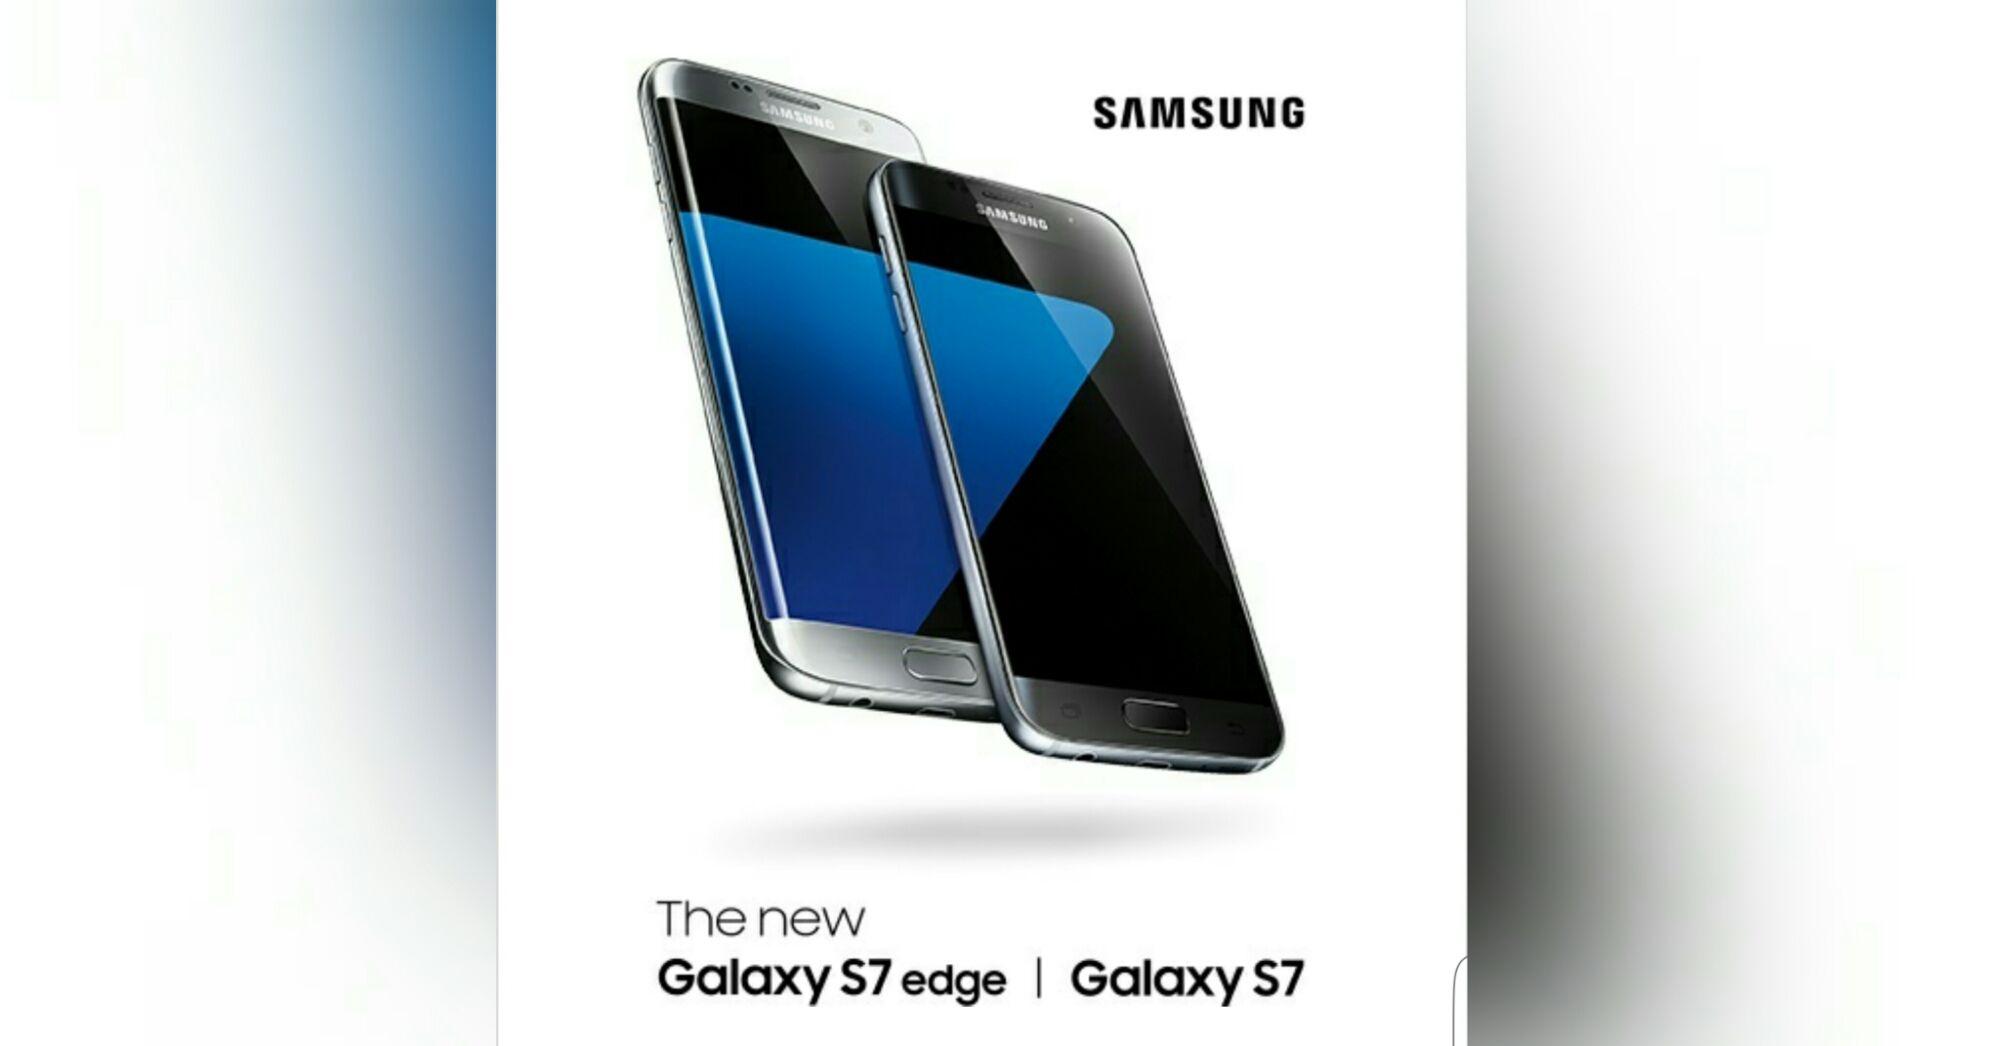 Pin By Aw My Posh On Gizmo Samsung Galaxy S7 Samsung Galaxy S7